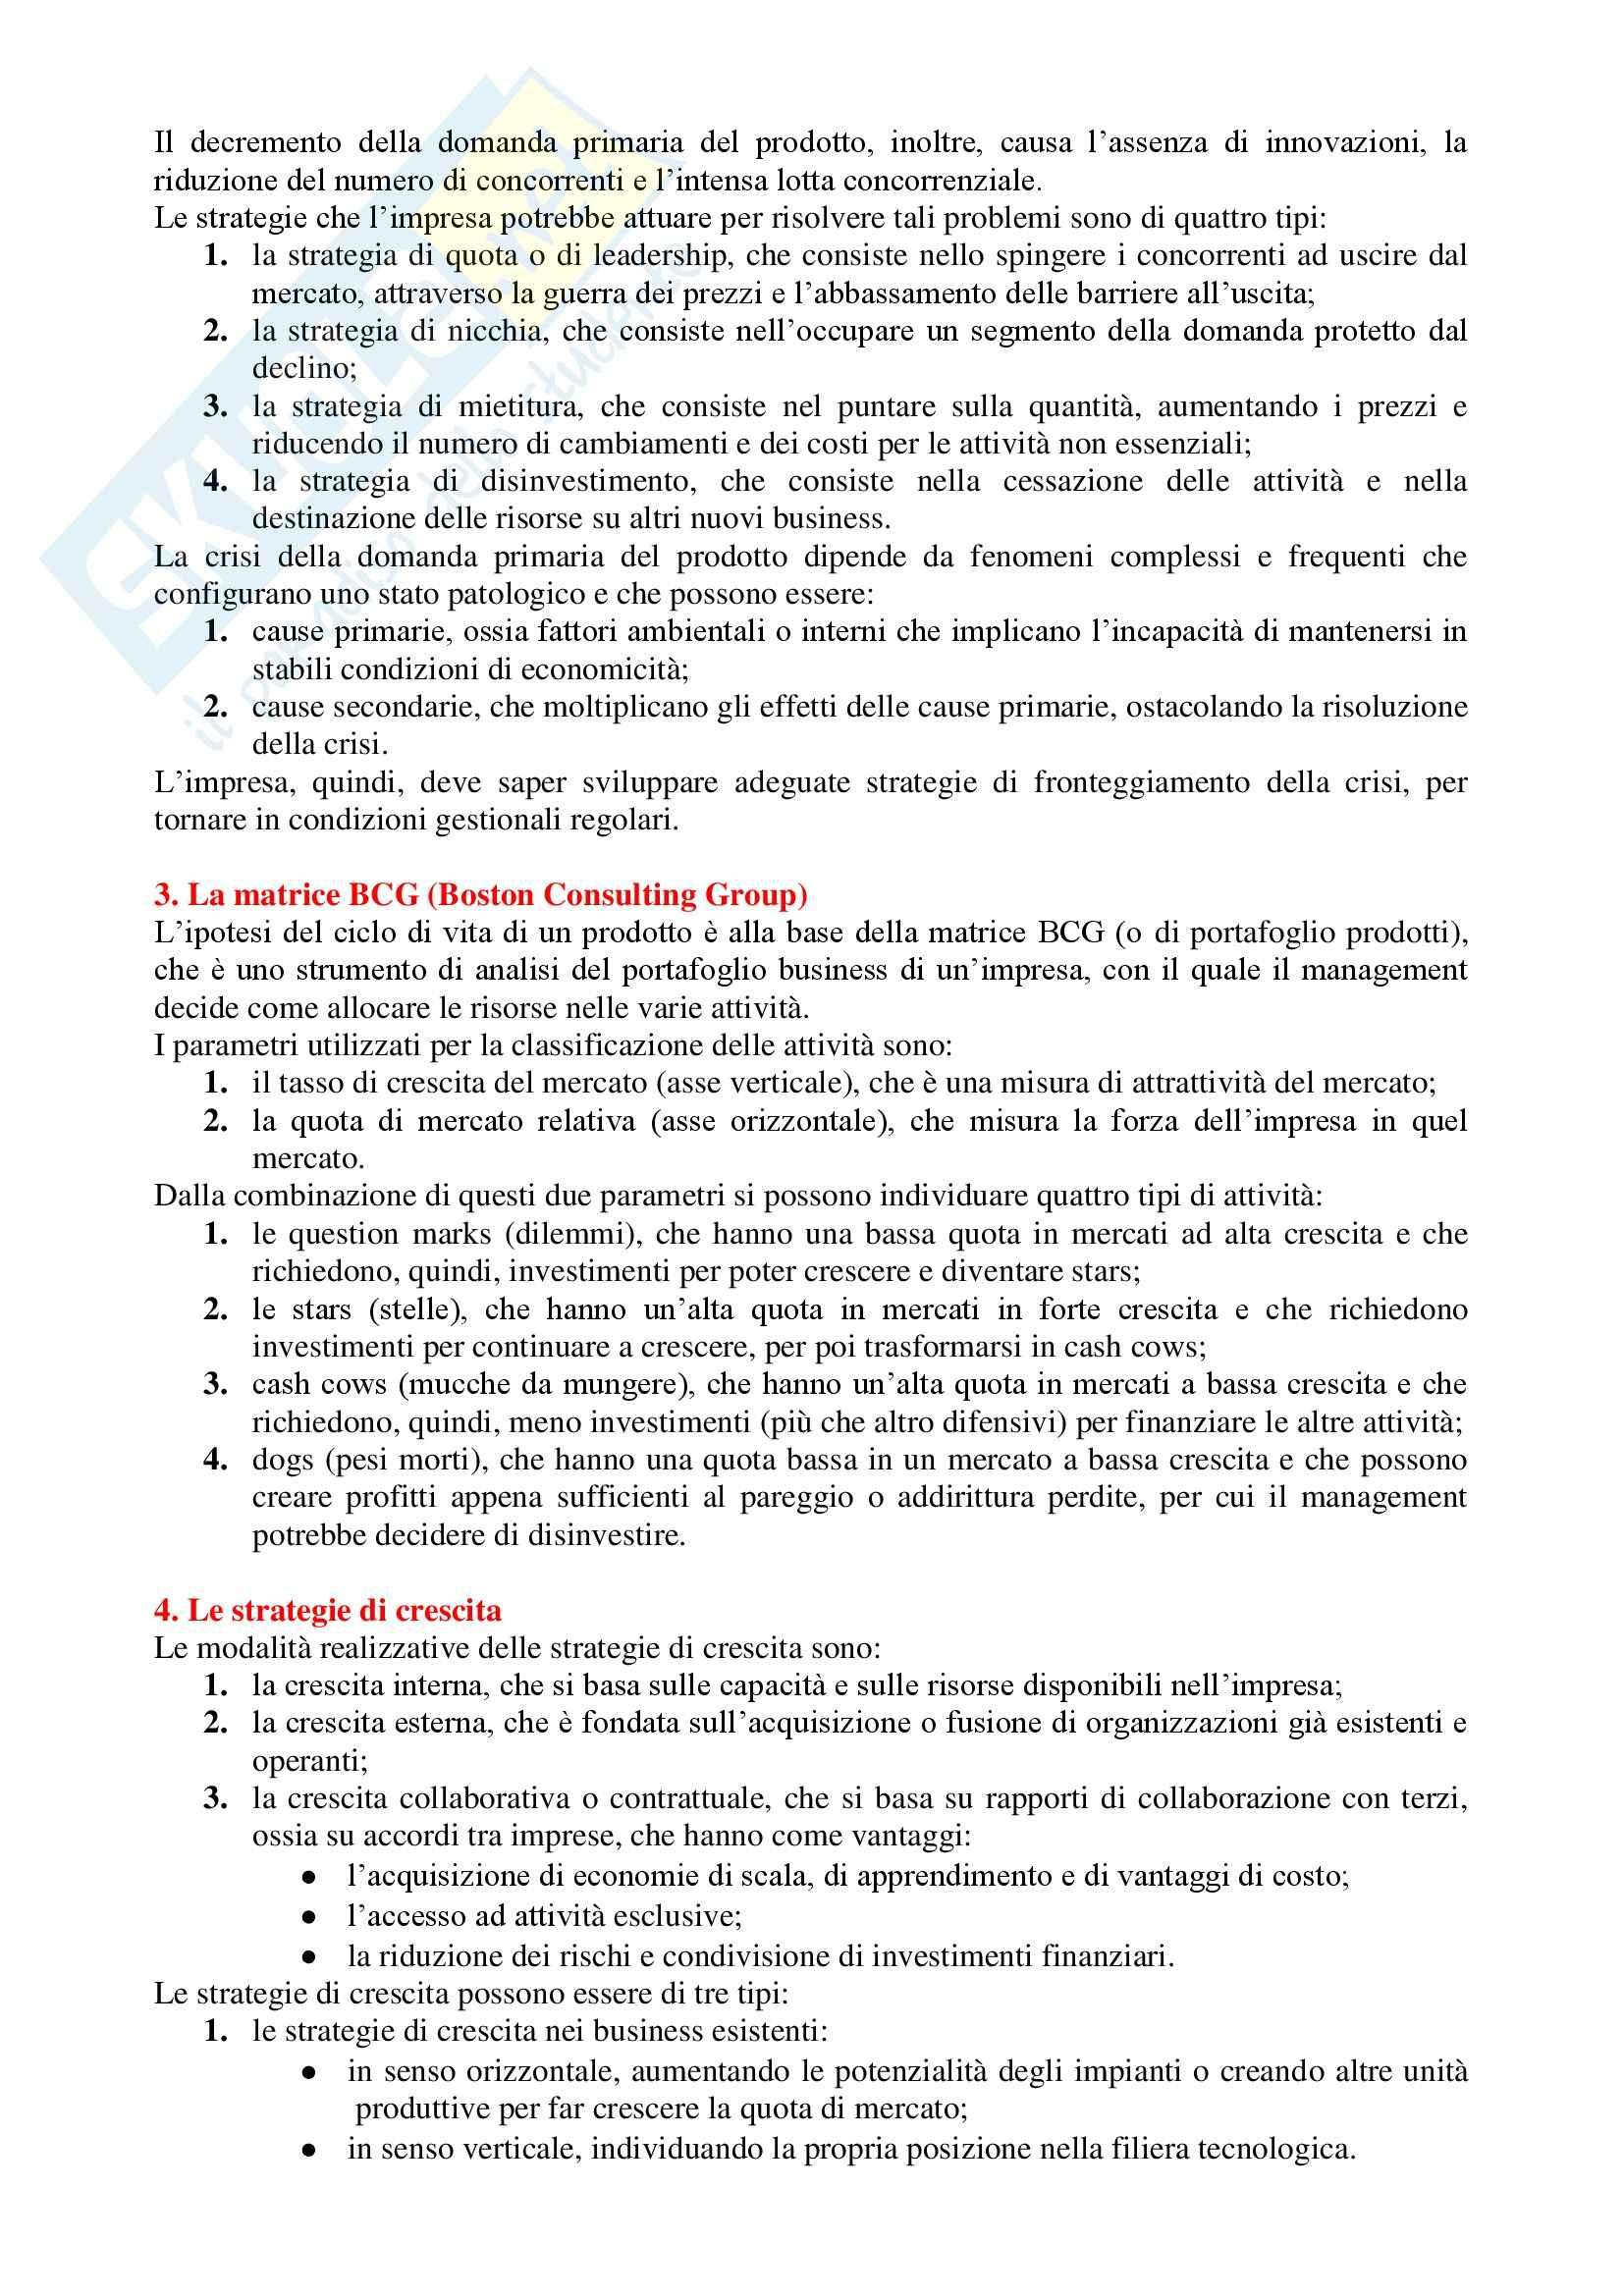 Fondamenti di Management - Appunti Pag. 26